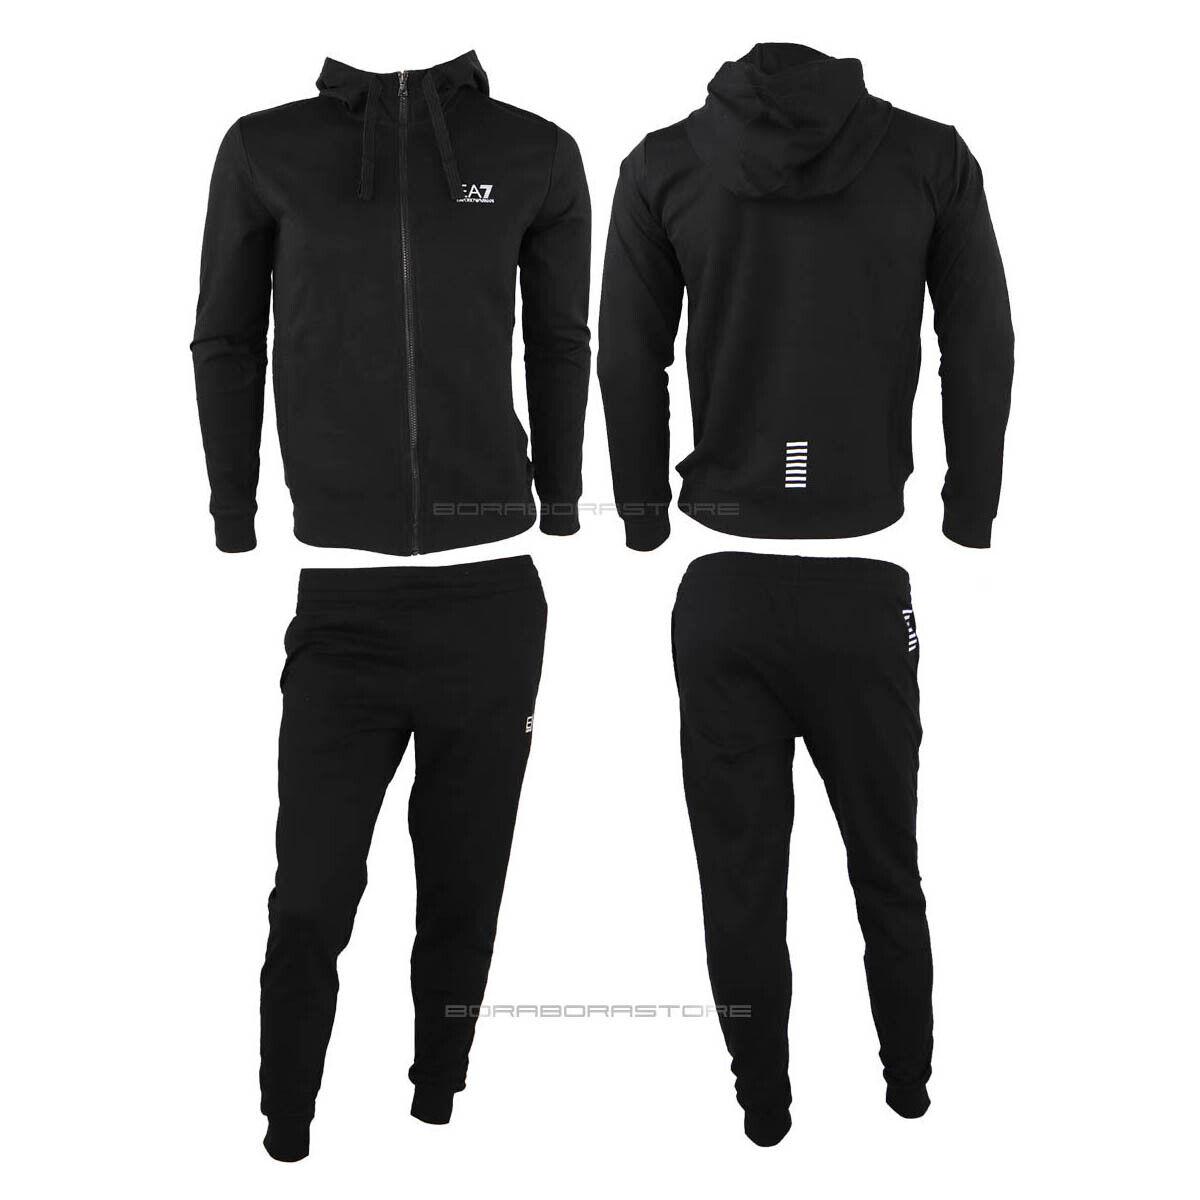 Emporio Armani EA7 Tracksuit pants Sweatshirt Man 8NPV80 PJ05Z black